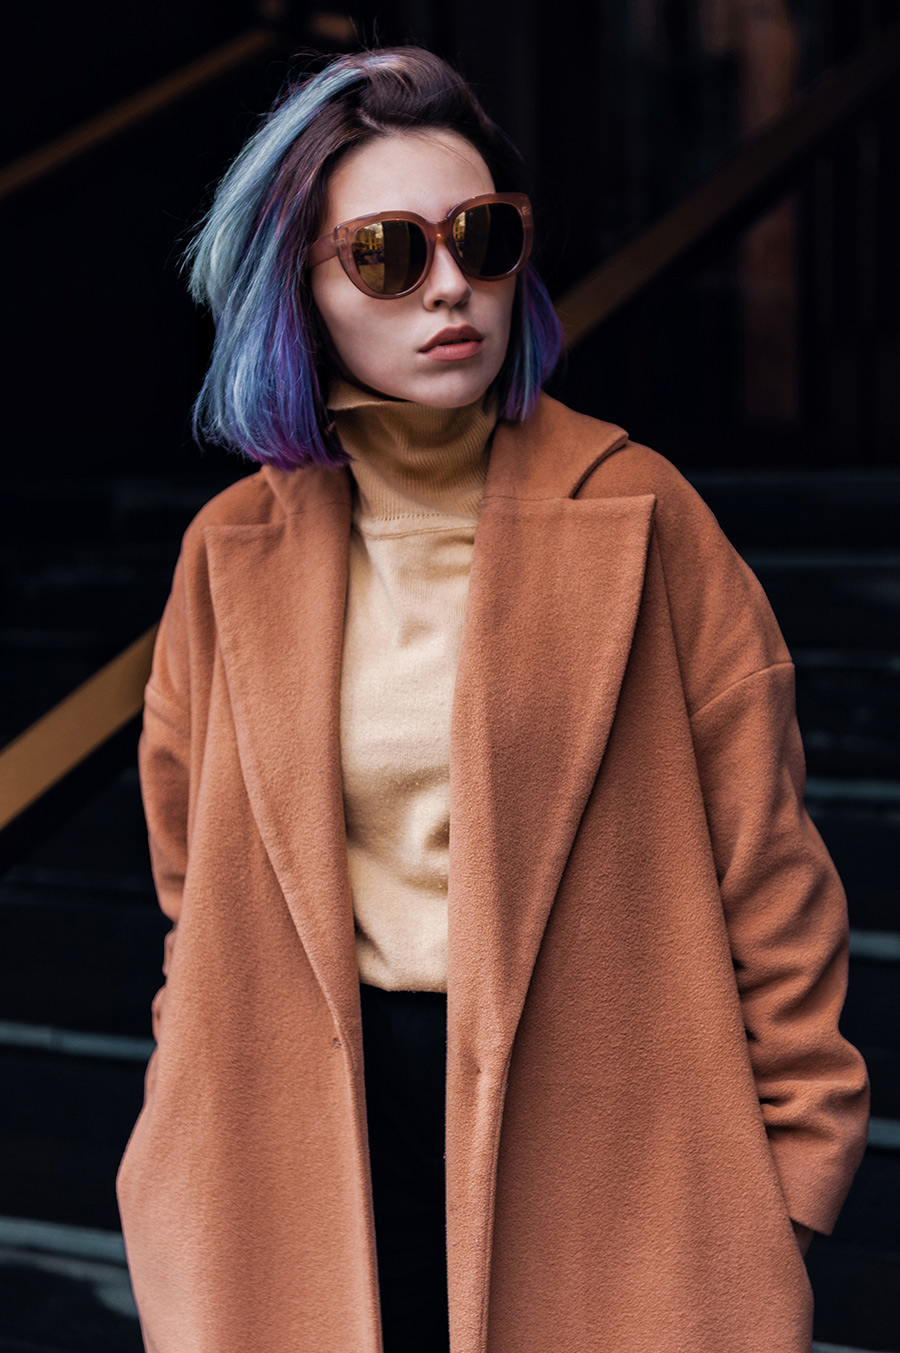 5-fashion-photography-clothing-photography-london-liverpool-manchester-birmingham-leeds-cardif-glasgow-edinburgh.jpg